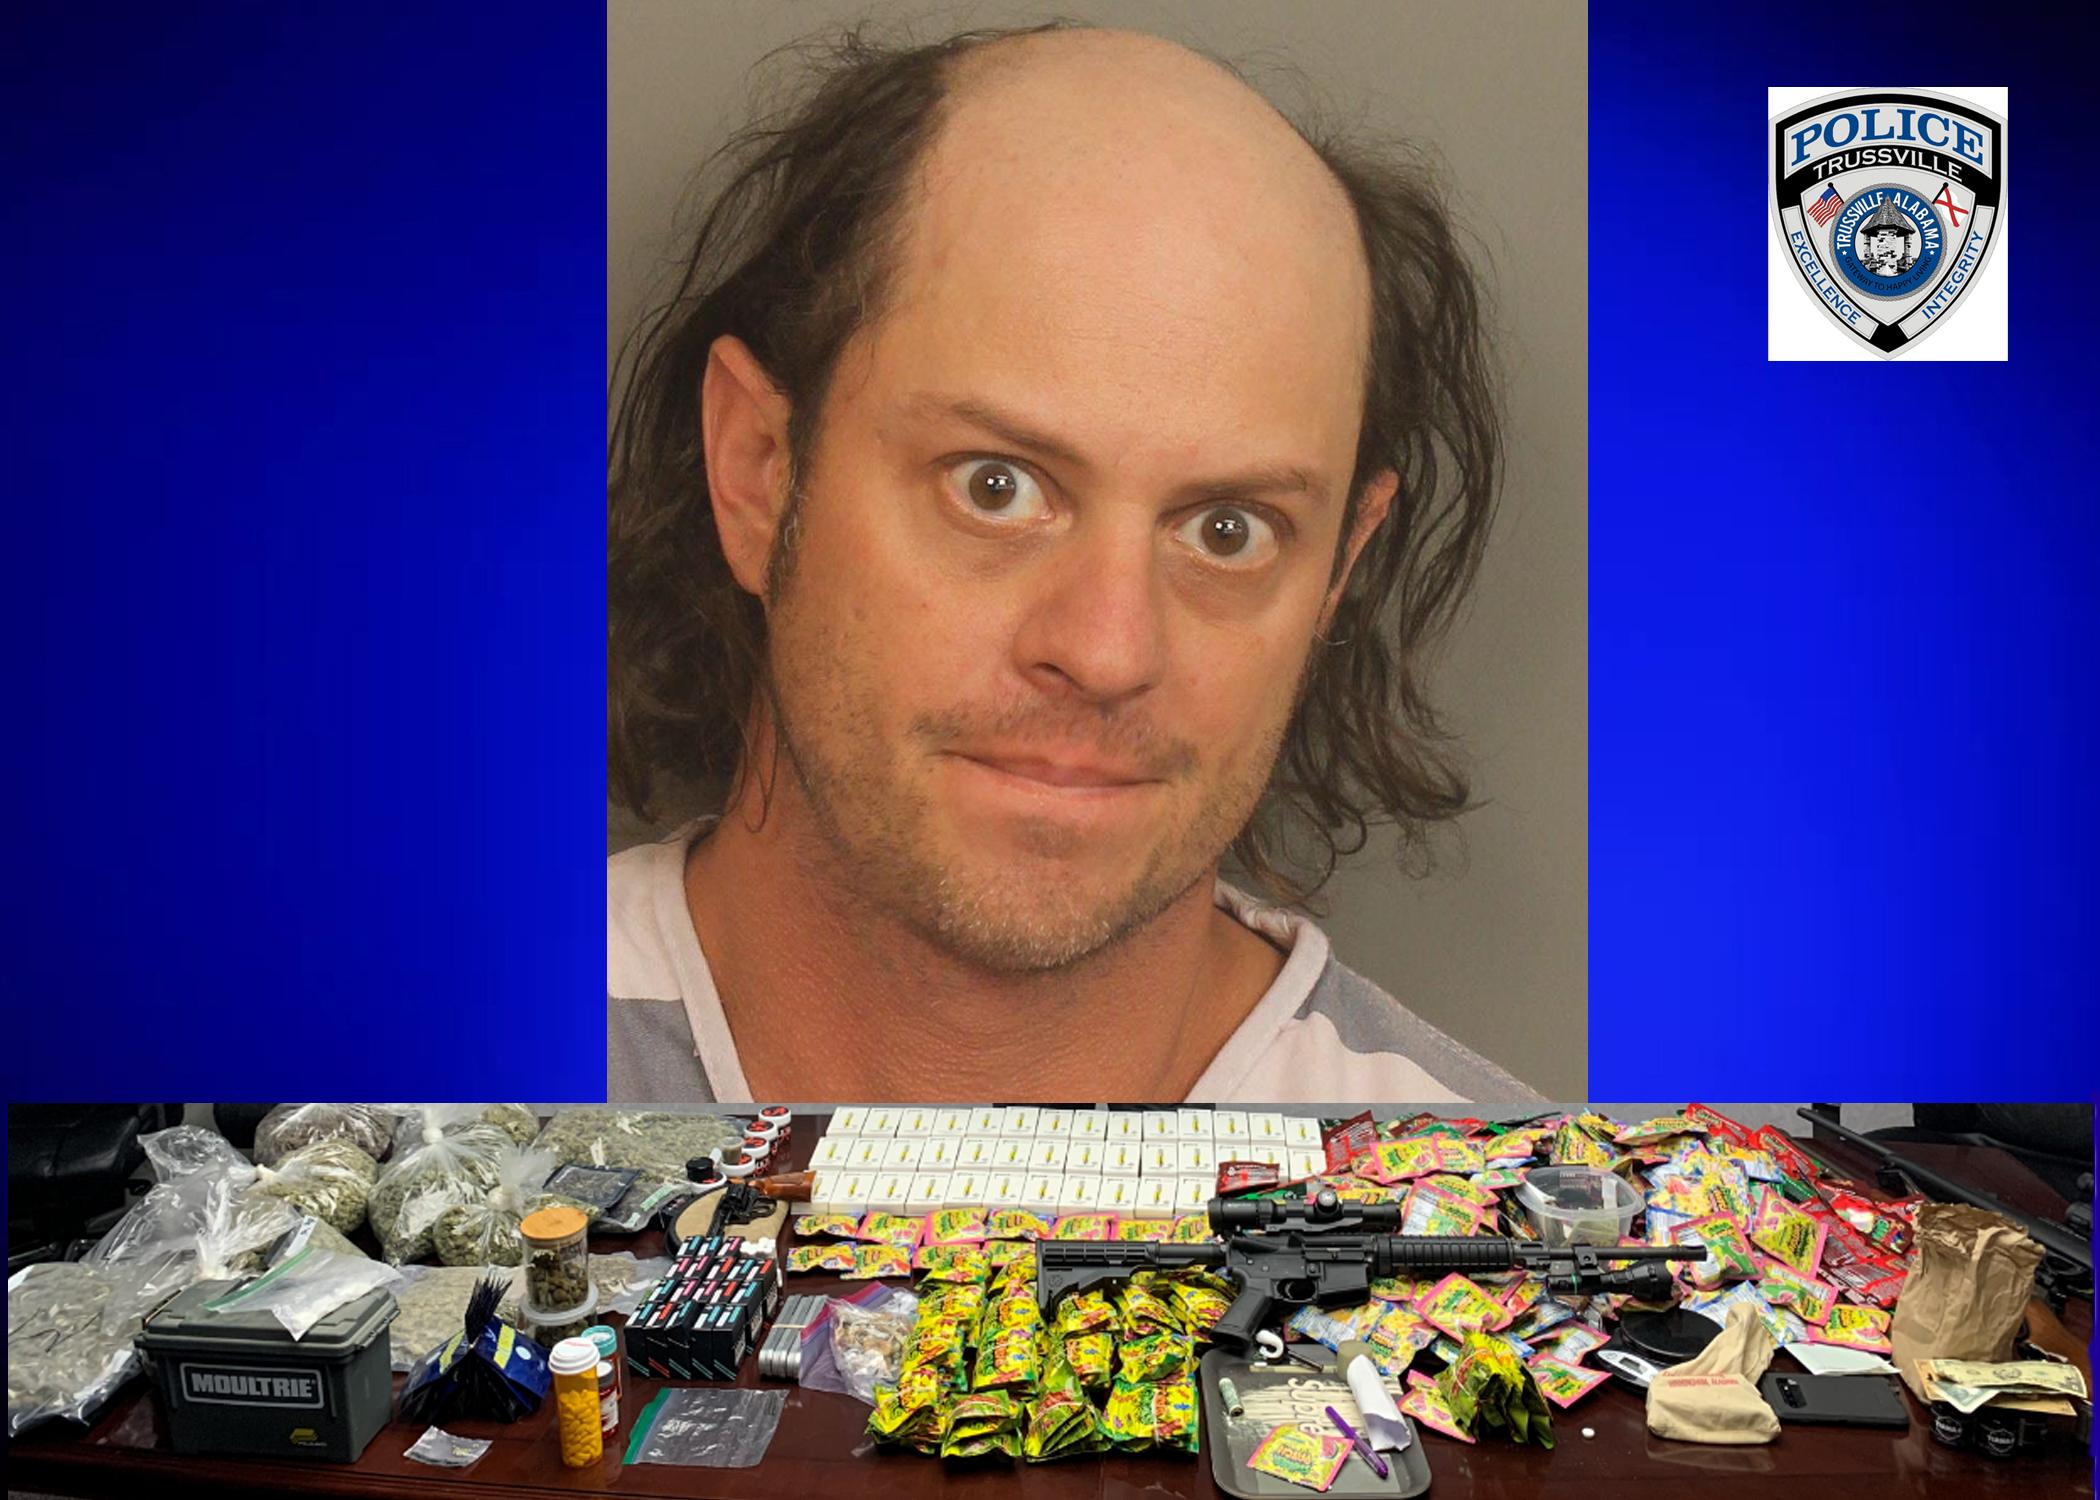 Arrest made after Trussville PD drug bust at Queenstown Rd. home